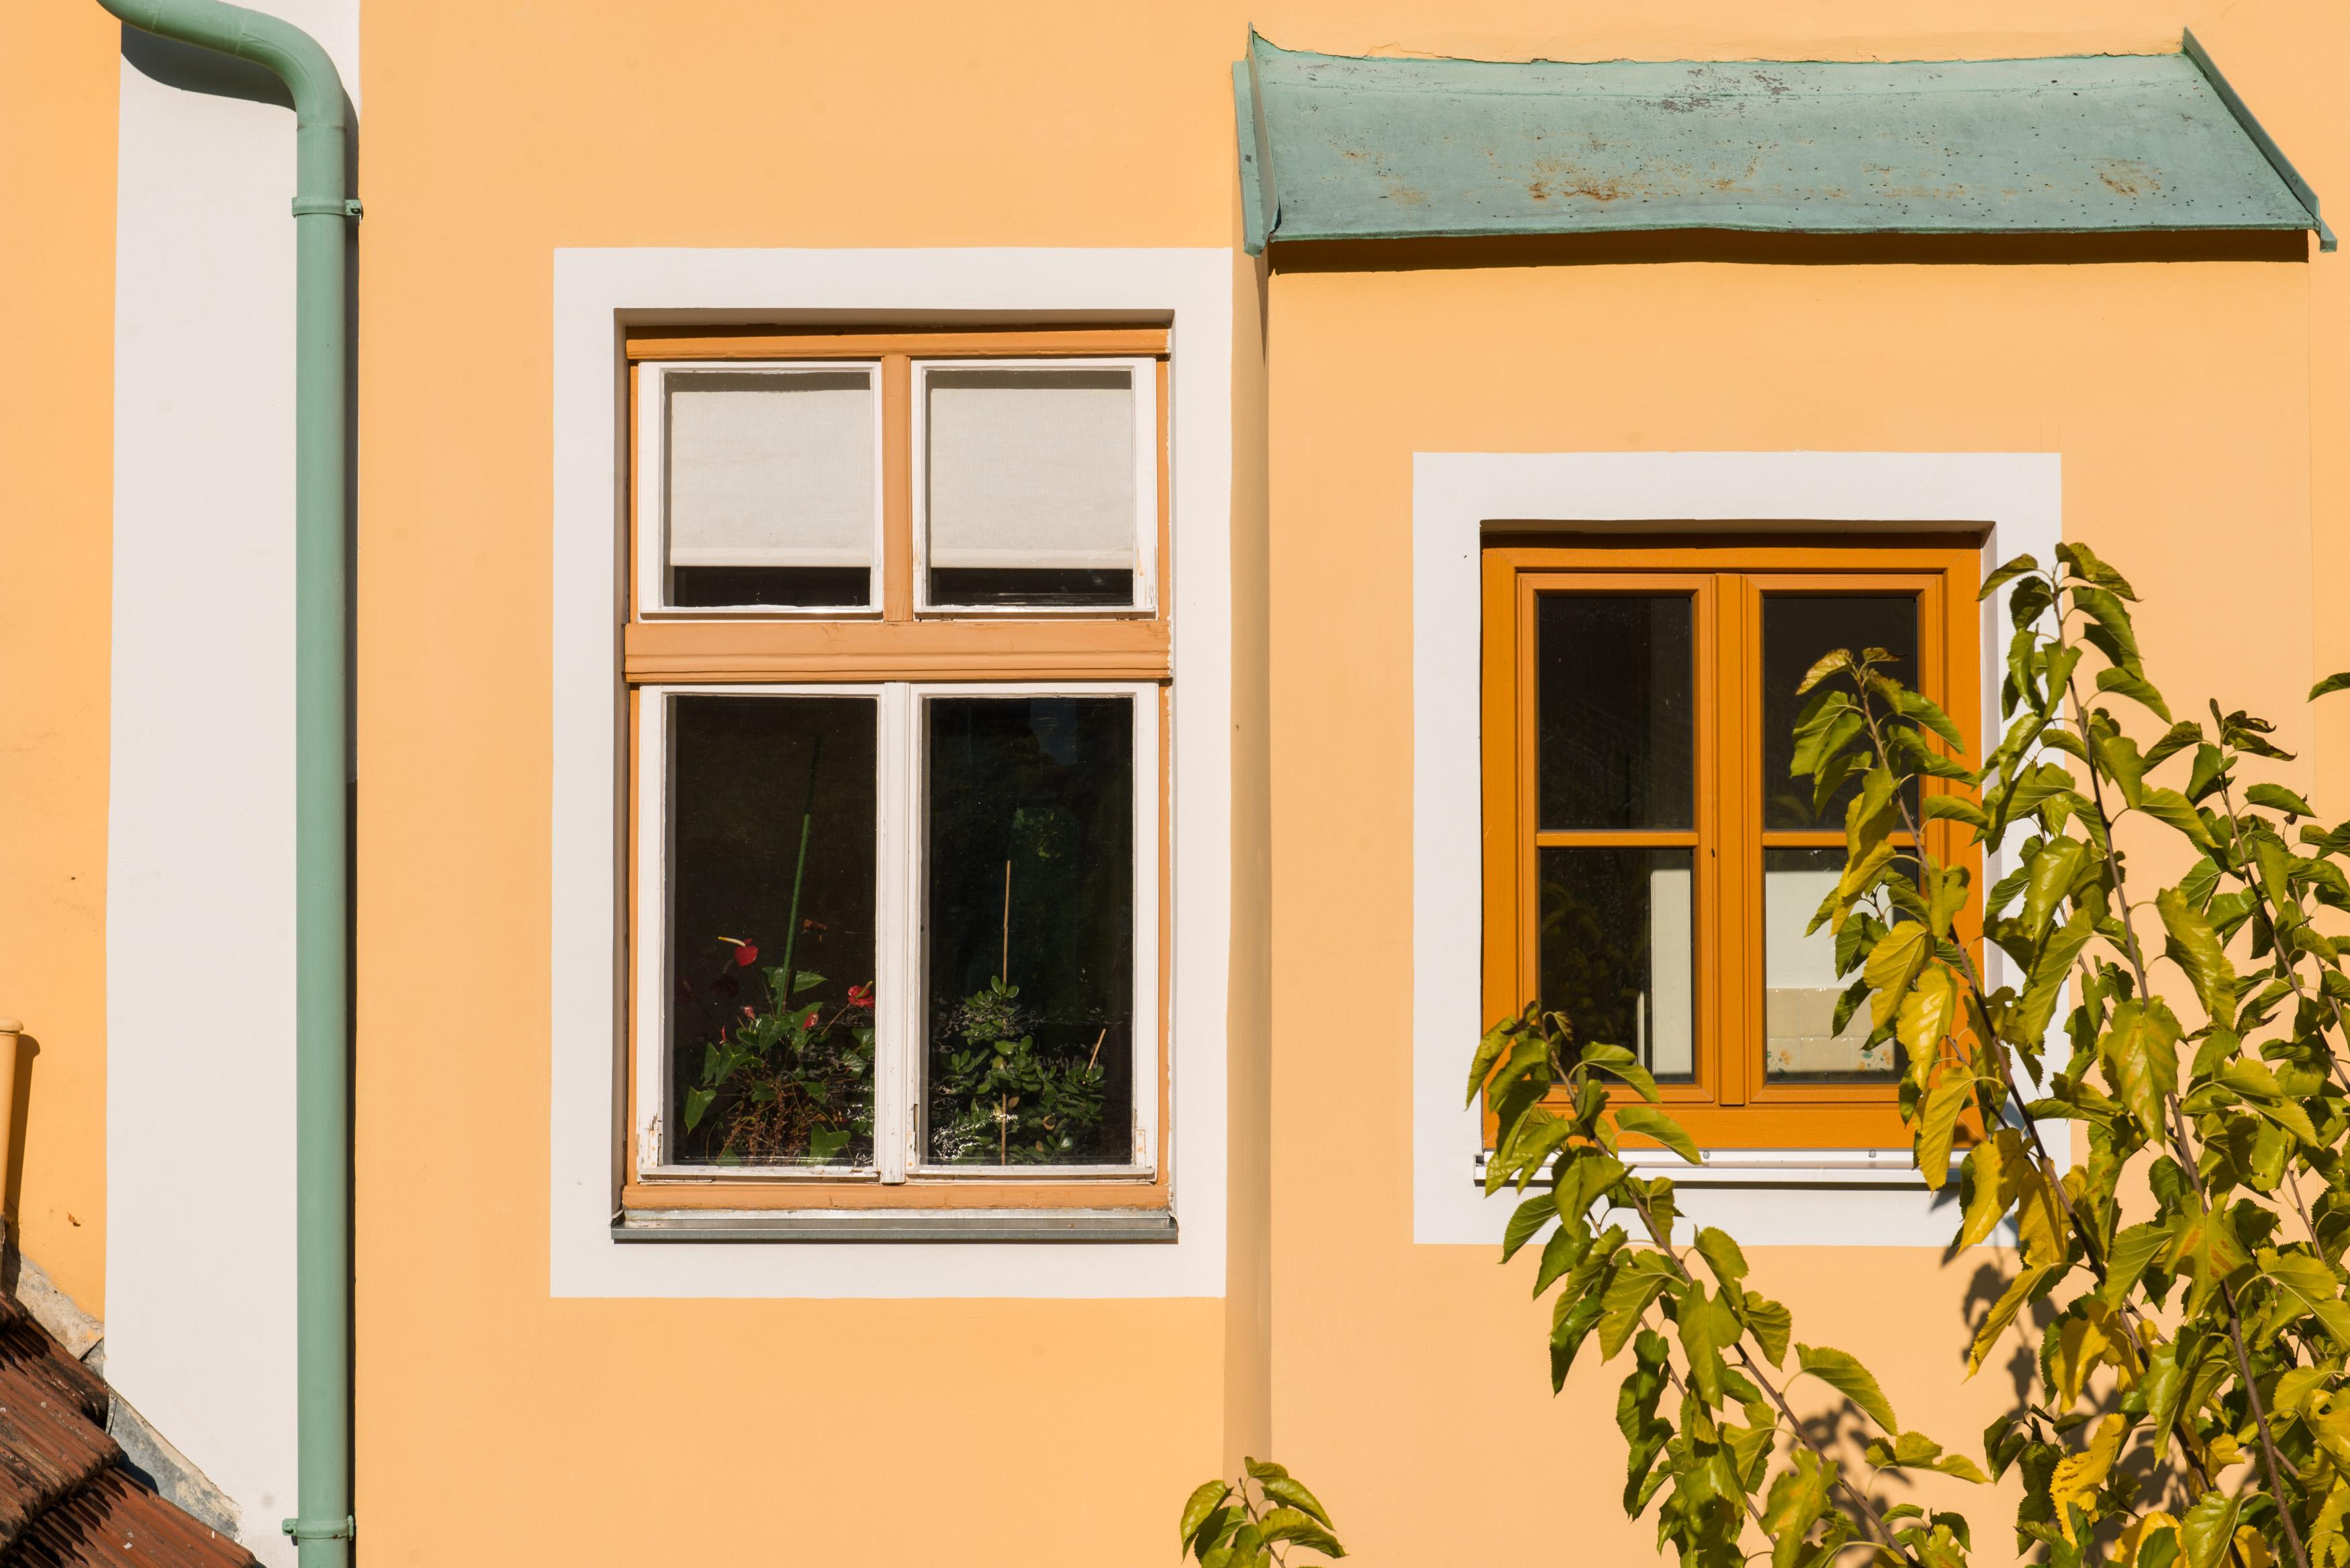 Fenster im Haupthaus © Punkt Fünf e.U./Martin Skopal